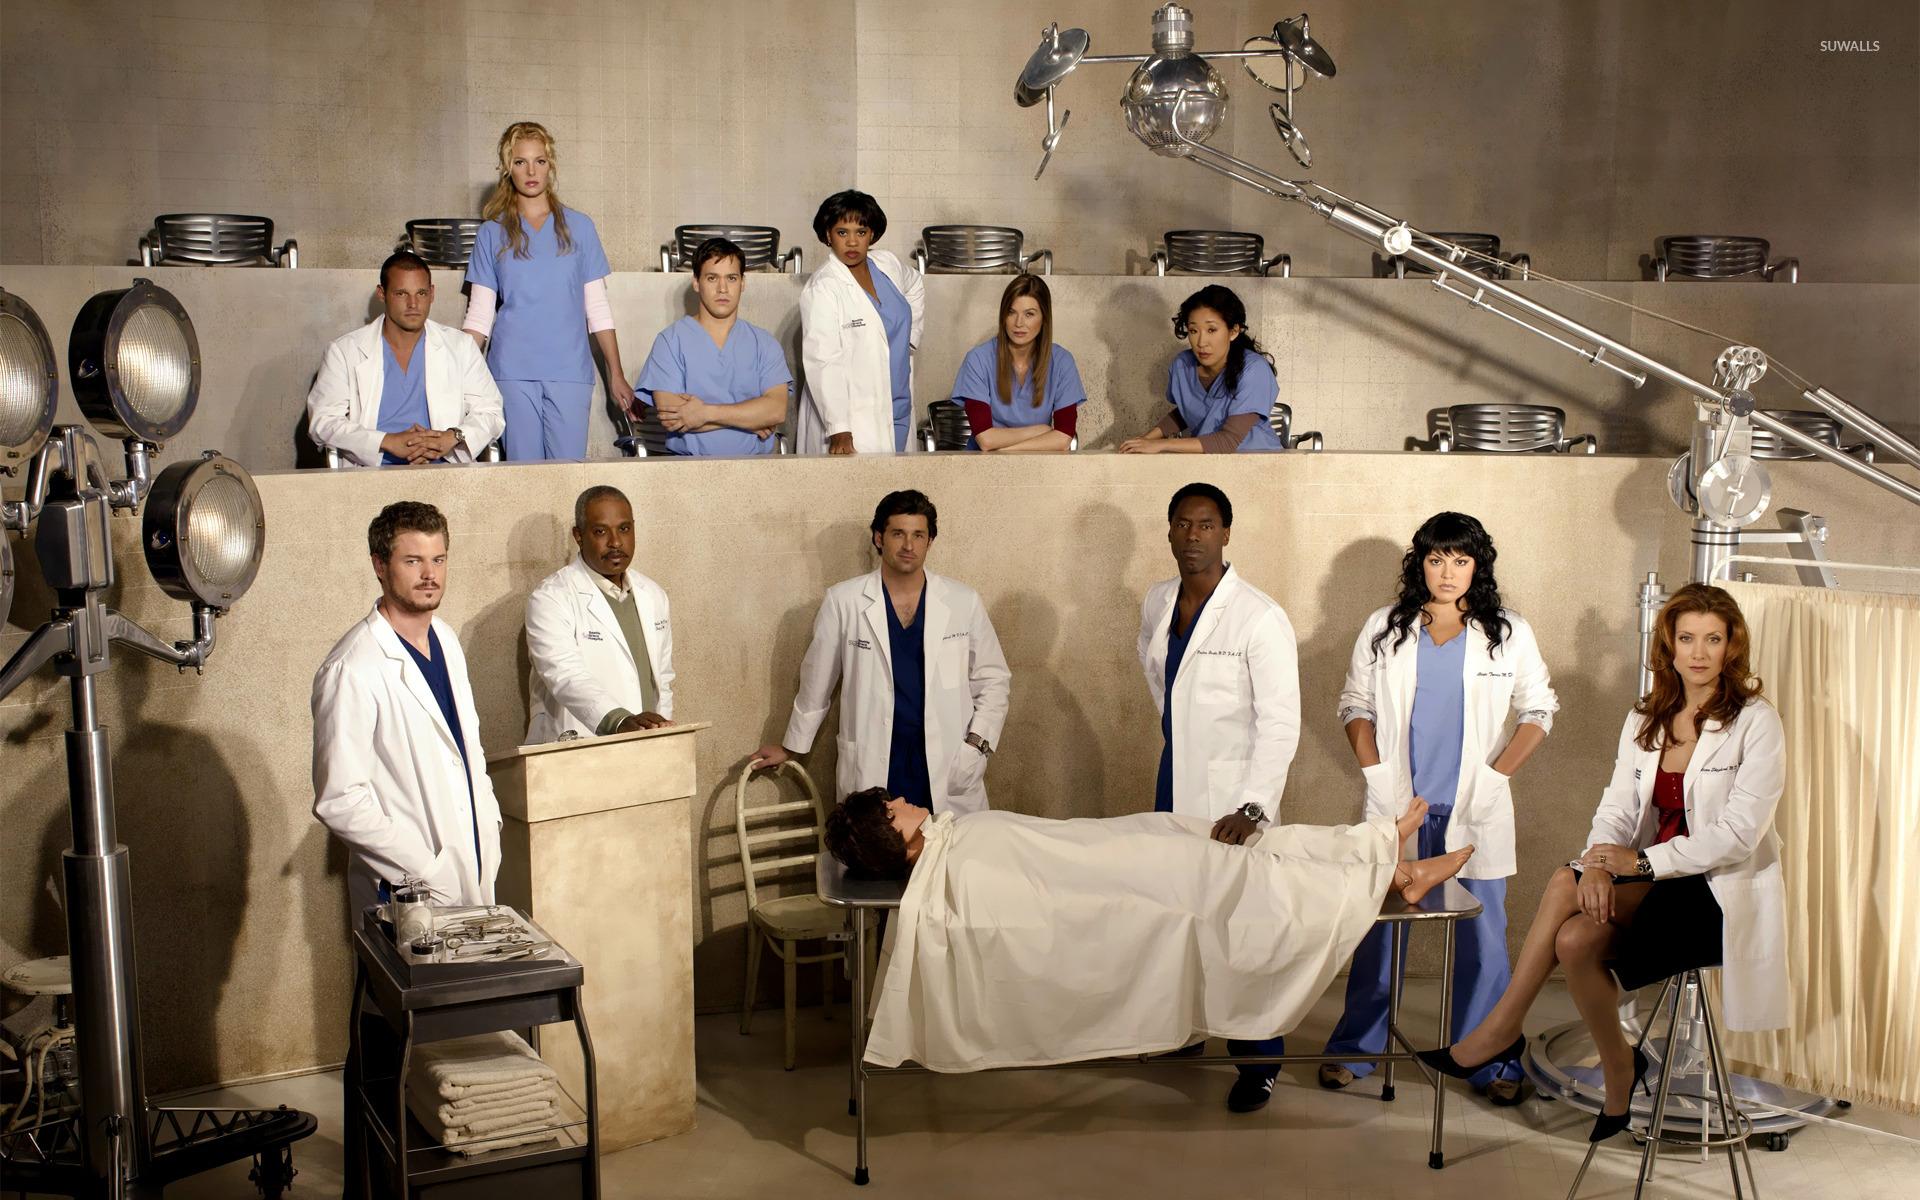 Greys Anatomy 8 Wallpaper Tv Show Wallpapers 15122